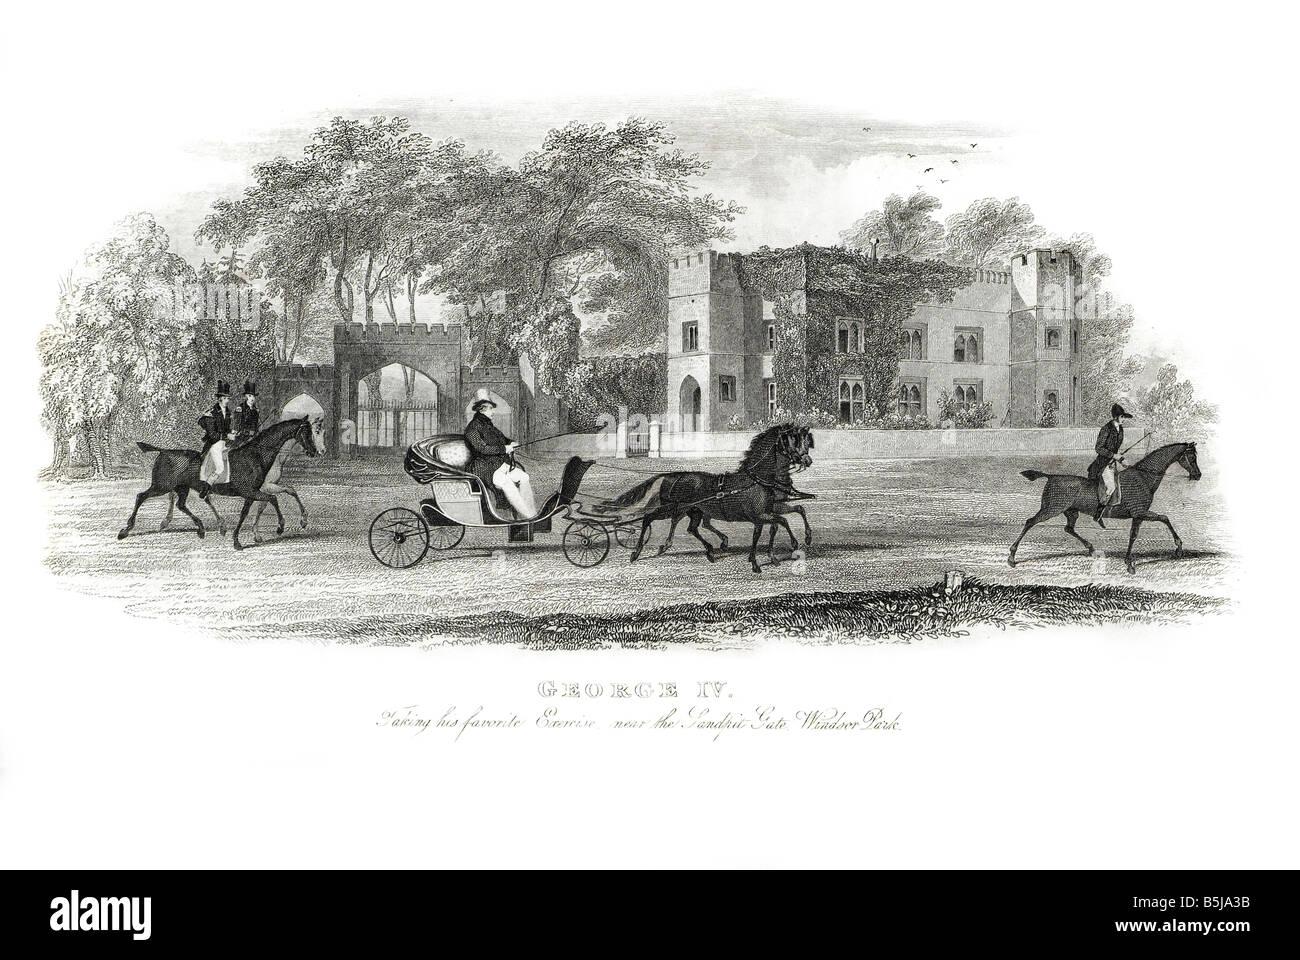 George IV Augustus Frederick 1762 1830 king United Kingdom of Great Britain and Ireland Hanover horse carriage landau - Stock Image